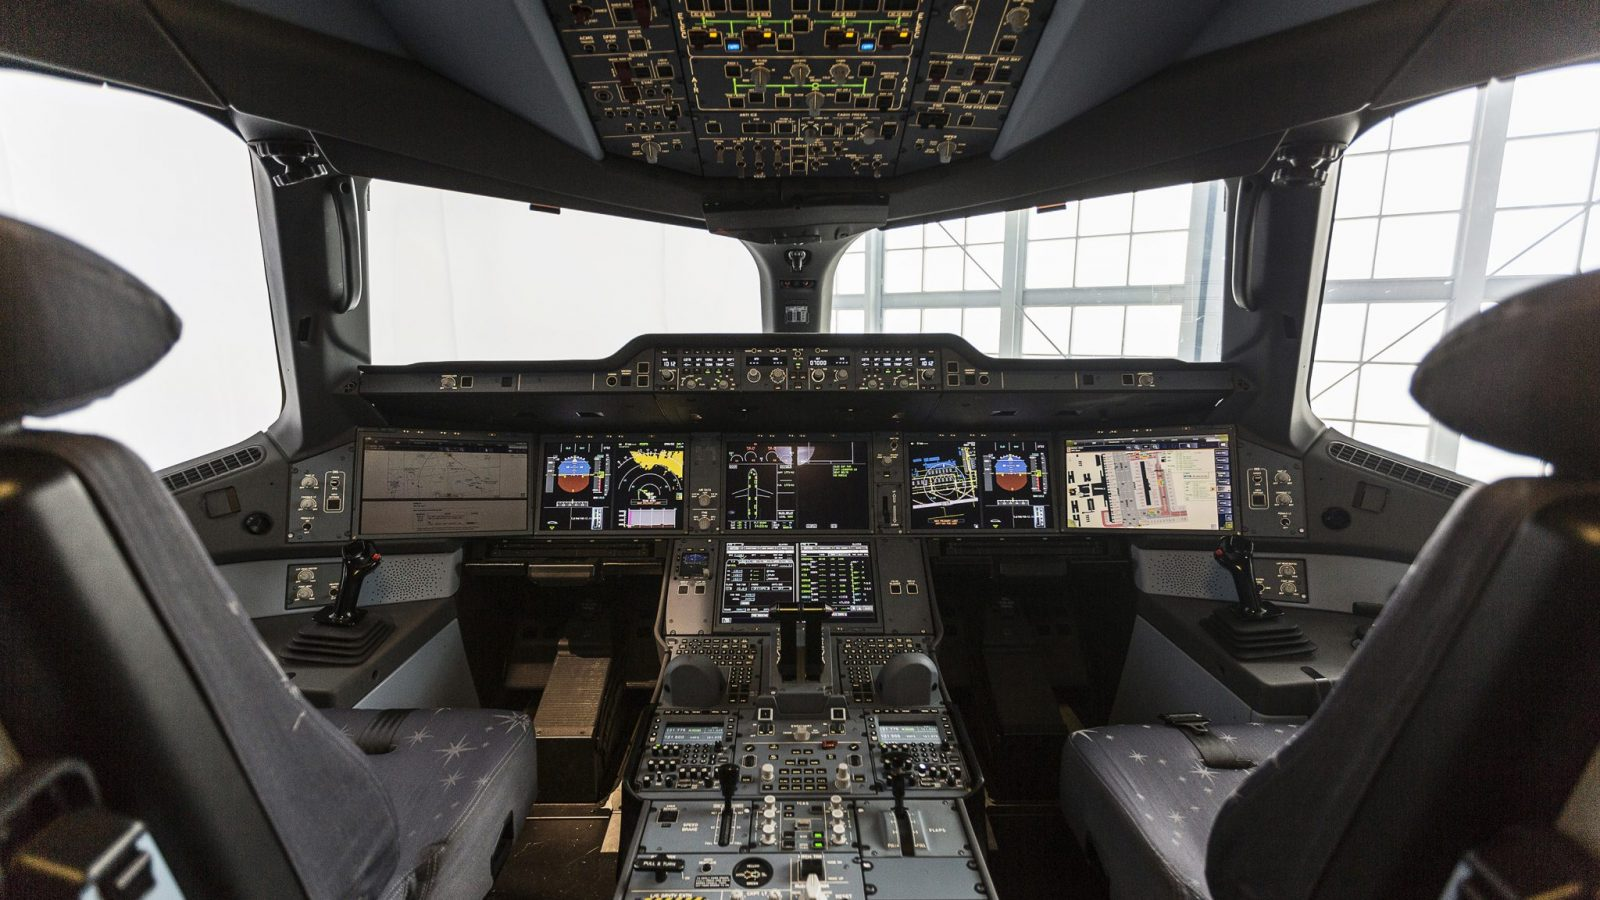 [VIDEO REPORTAŽA] Lufthansin A350-900: Kako je leteti najmodernijim širokotrupnim avionom na planeti